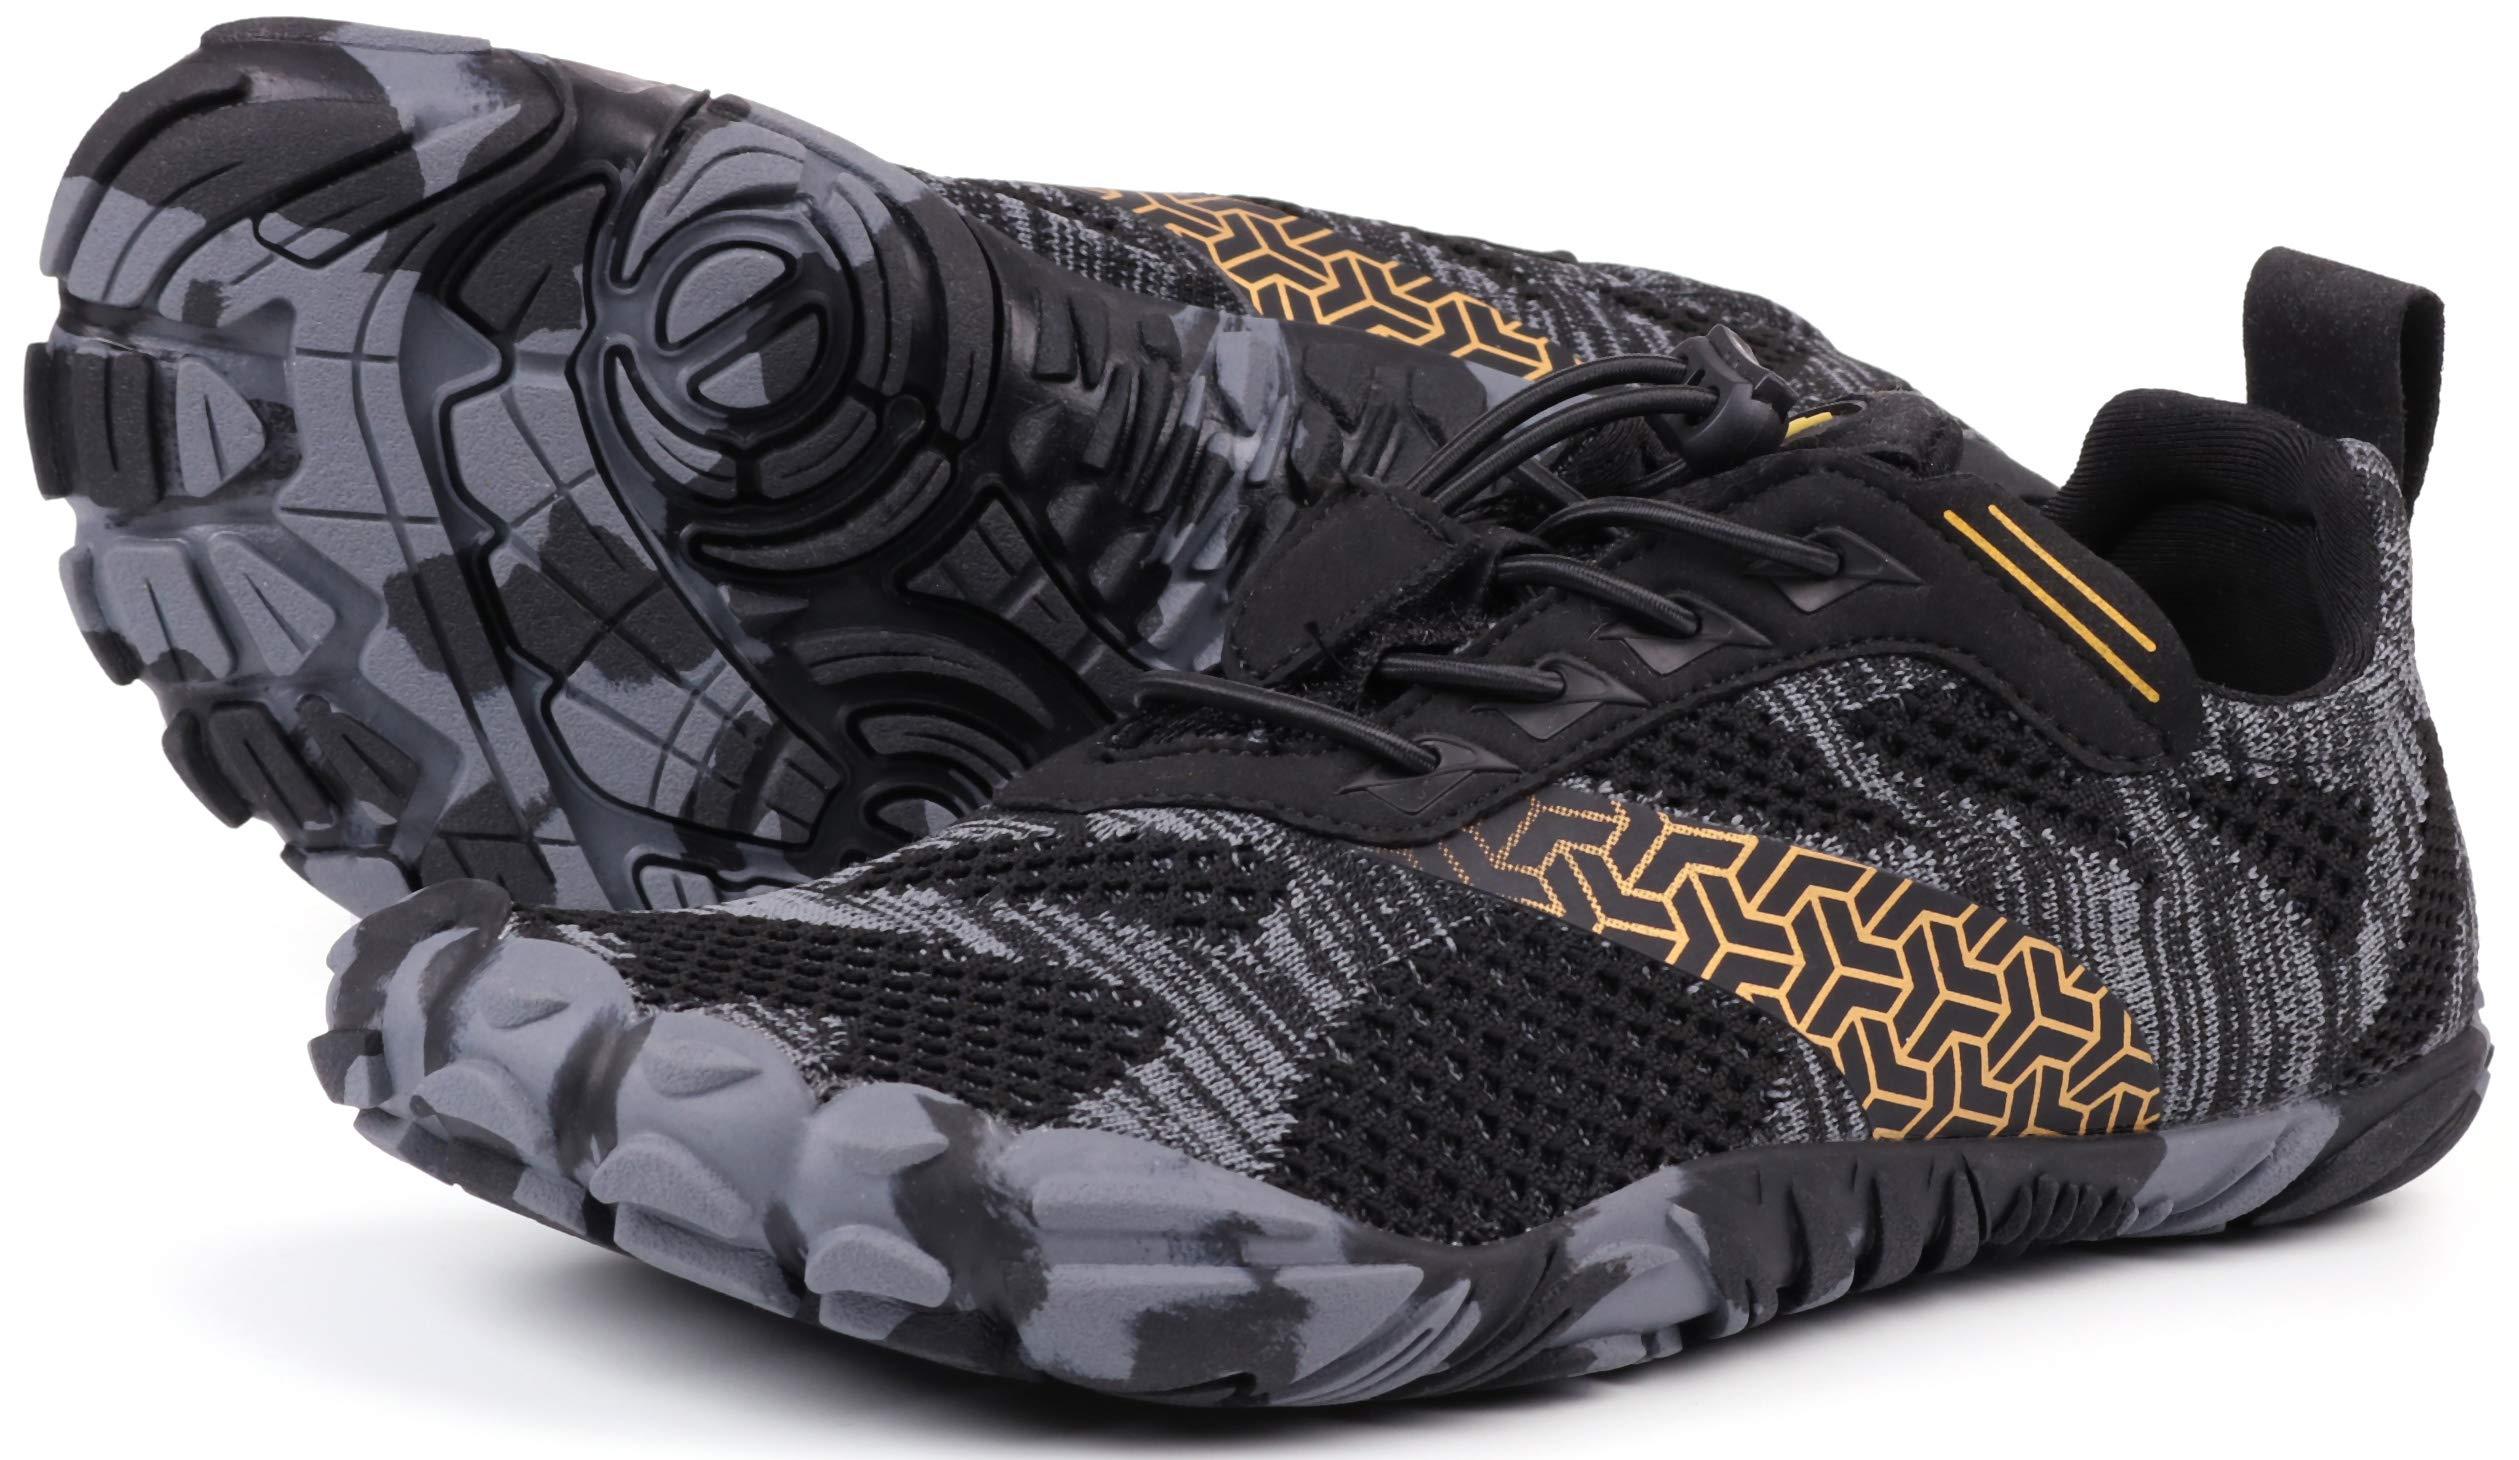 JOOMRA Women's Trail Running Minimal Shoes Camping Trekking Toes Five Fingers Ladies Workout Sneaker Barefoot Walking Zapatos Deportivos de Mujer Black Size 6